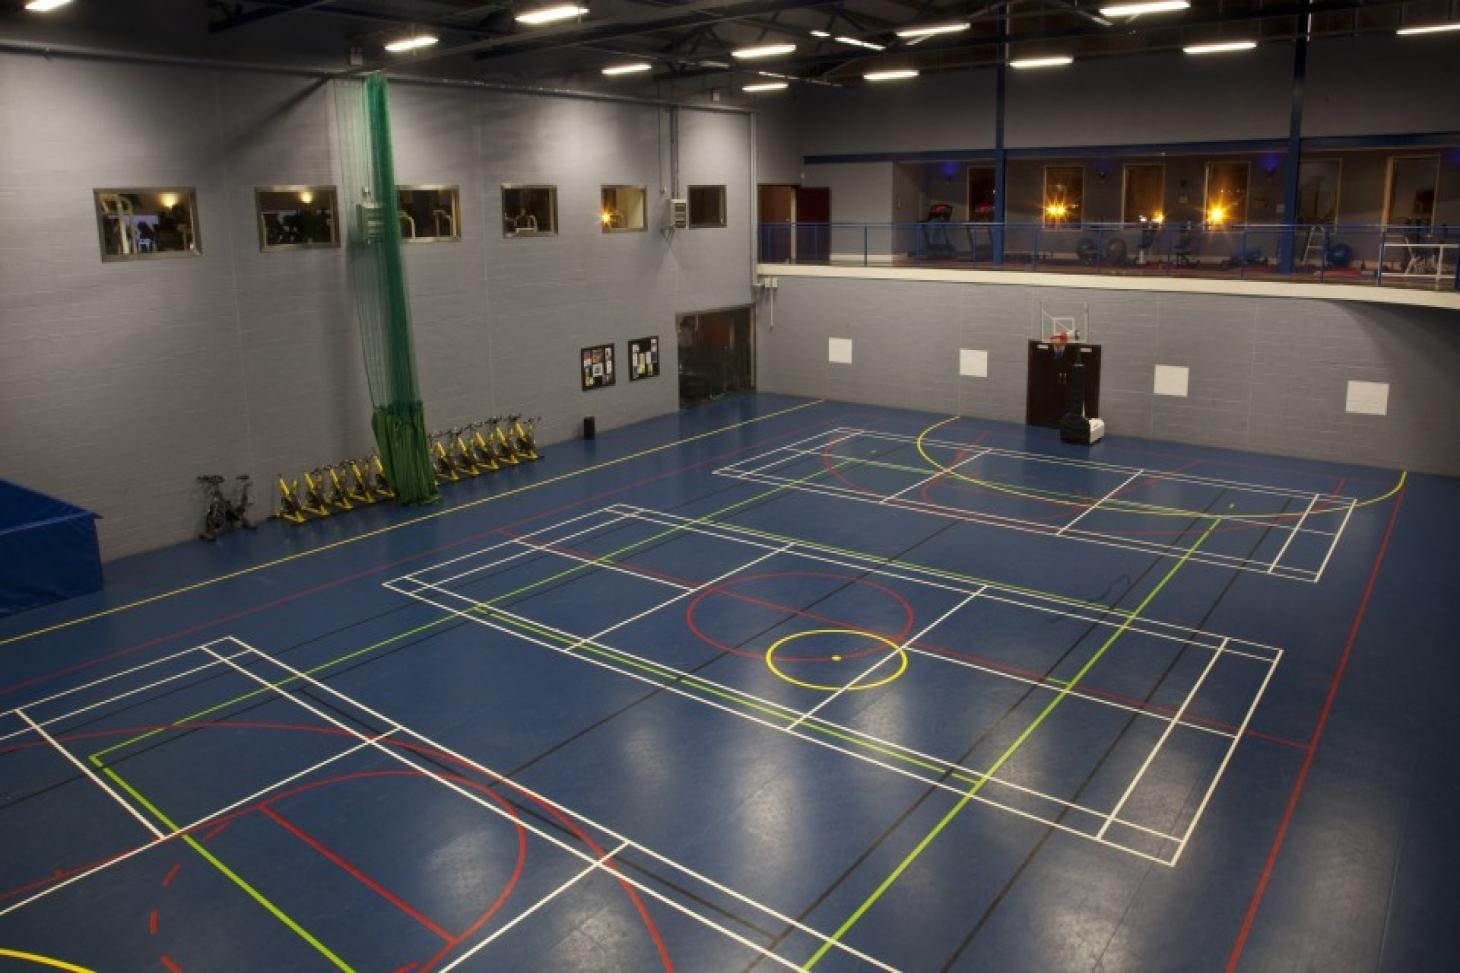 Westmanstown Sports & Conference Centre Indoor | Hard badminton court